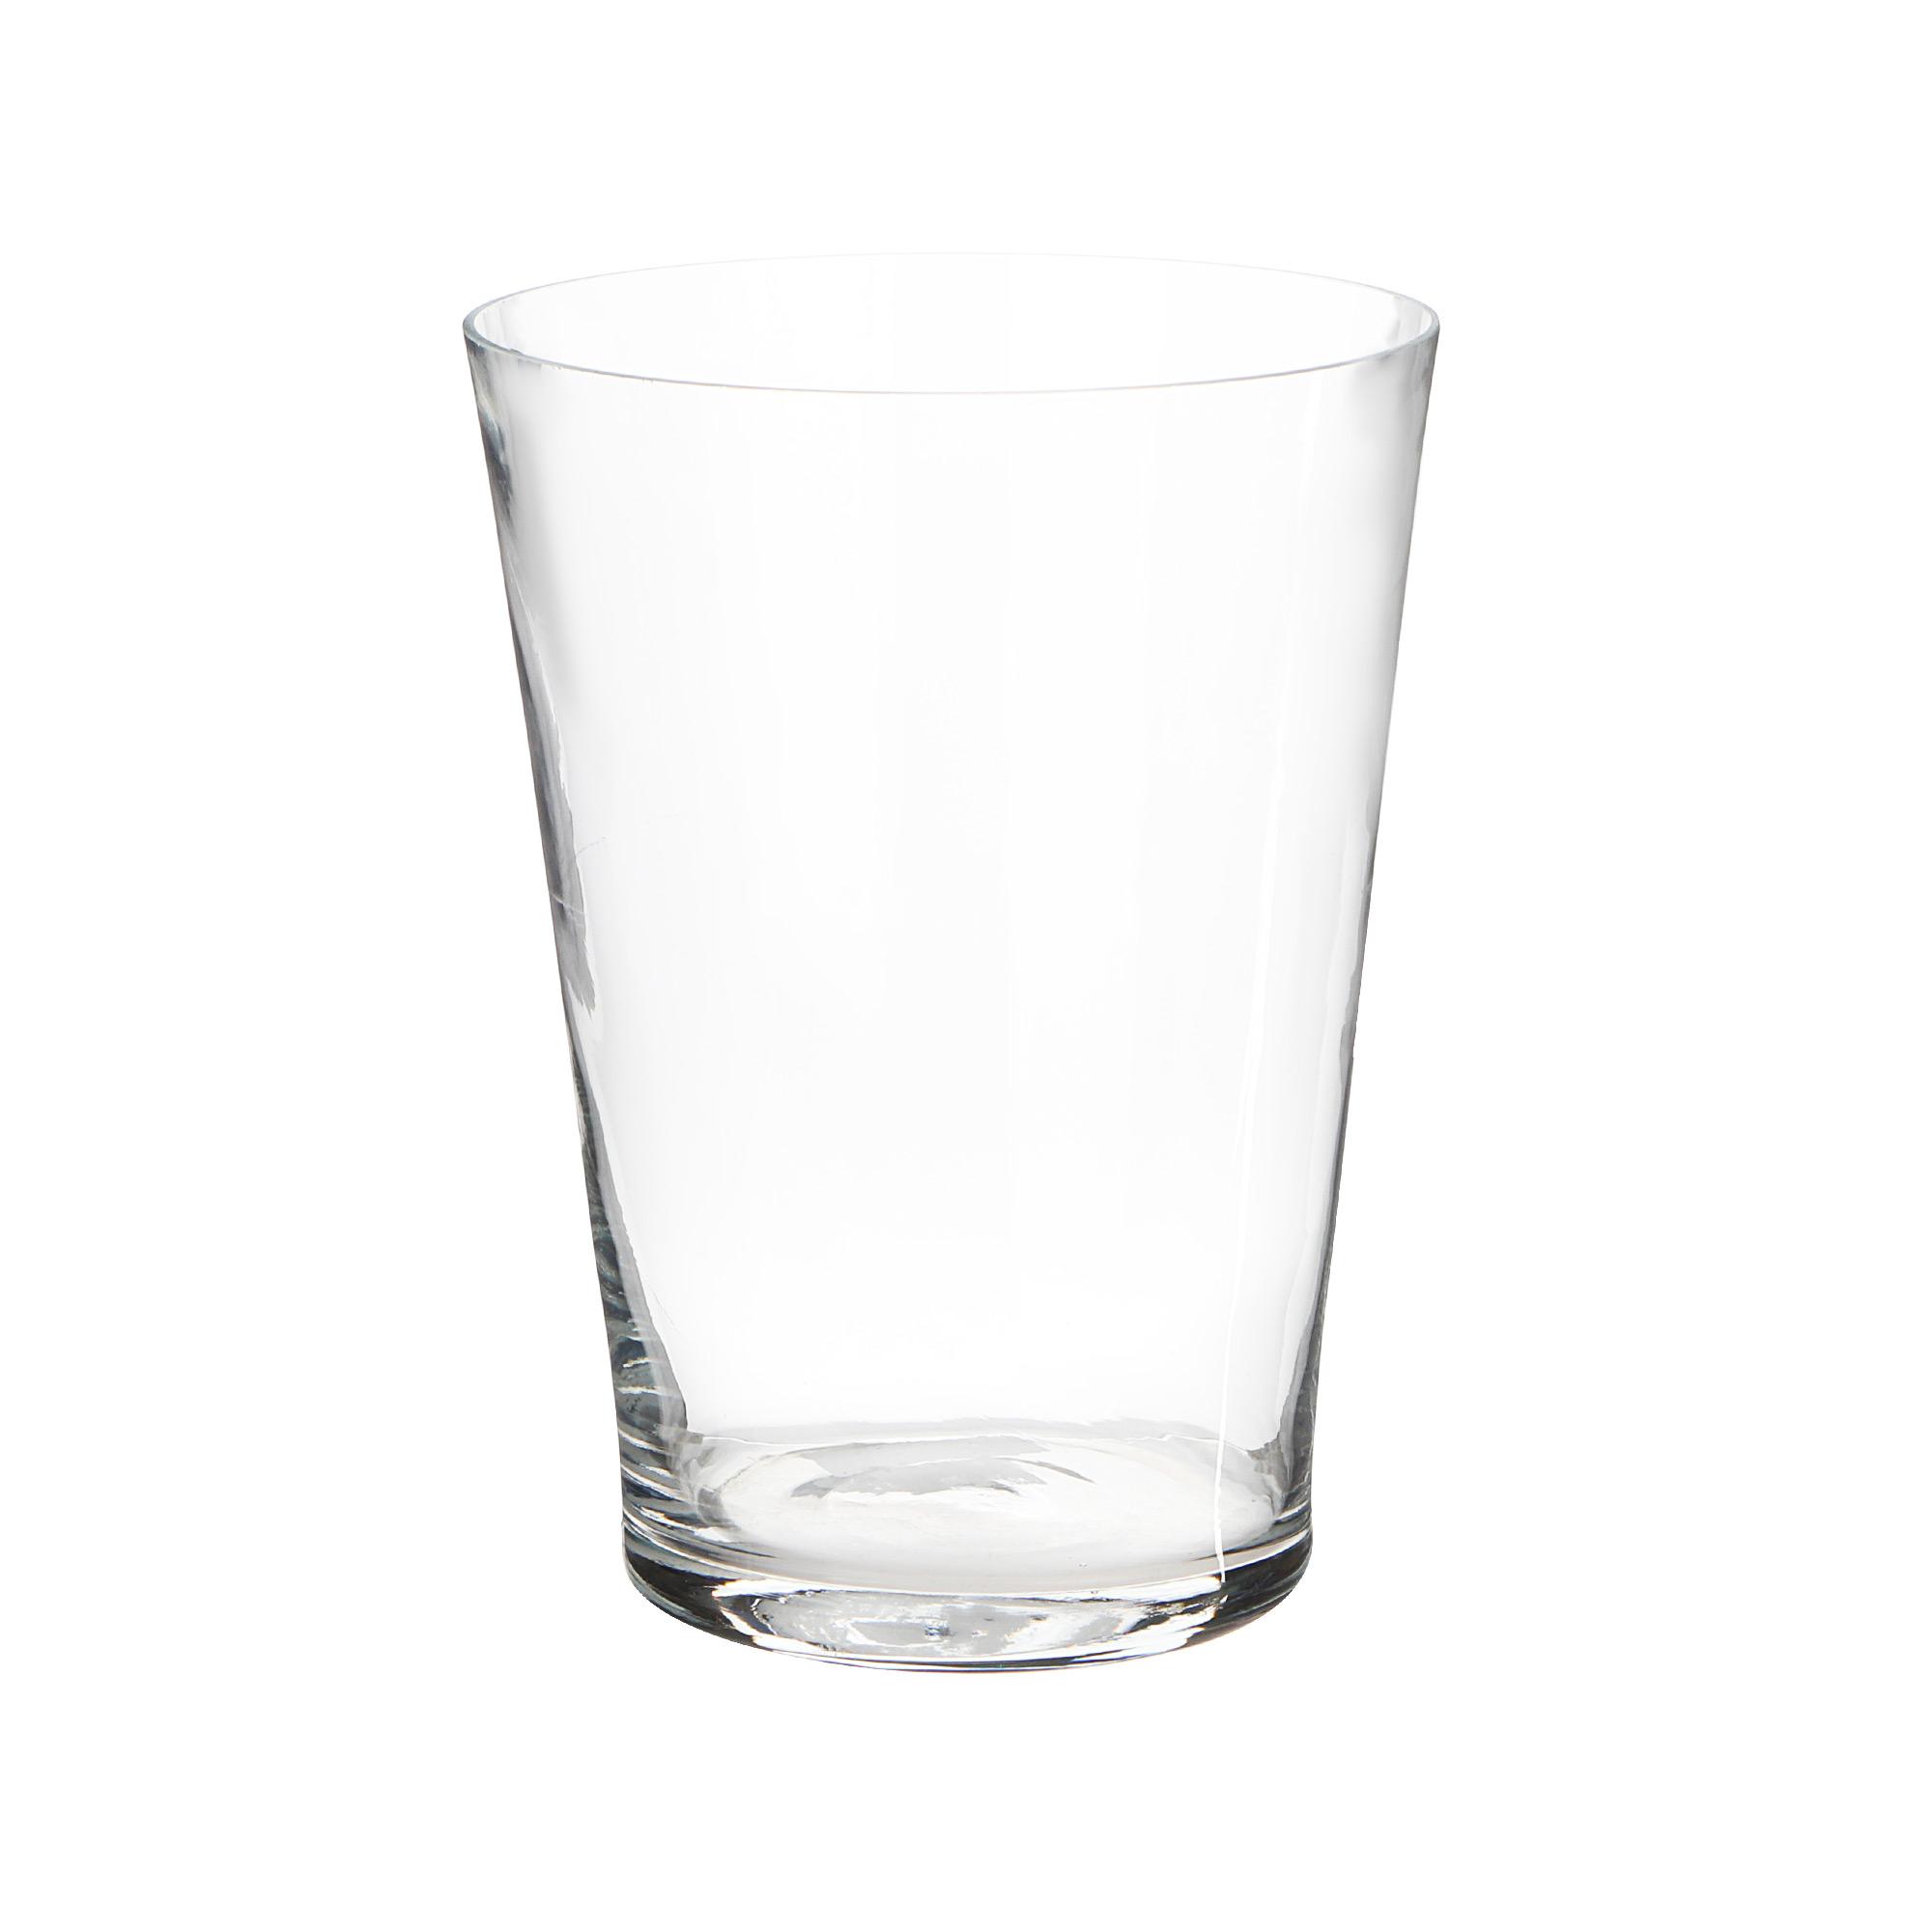 Ваза Hakbijl glass cold cut 22х30 см